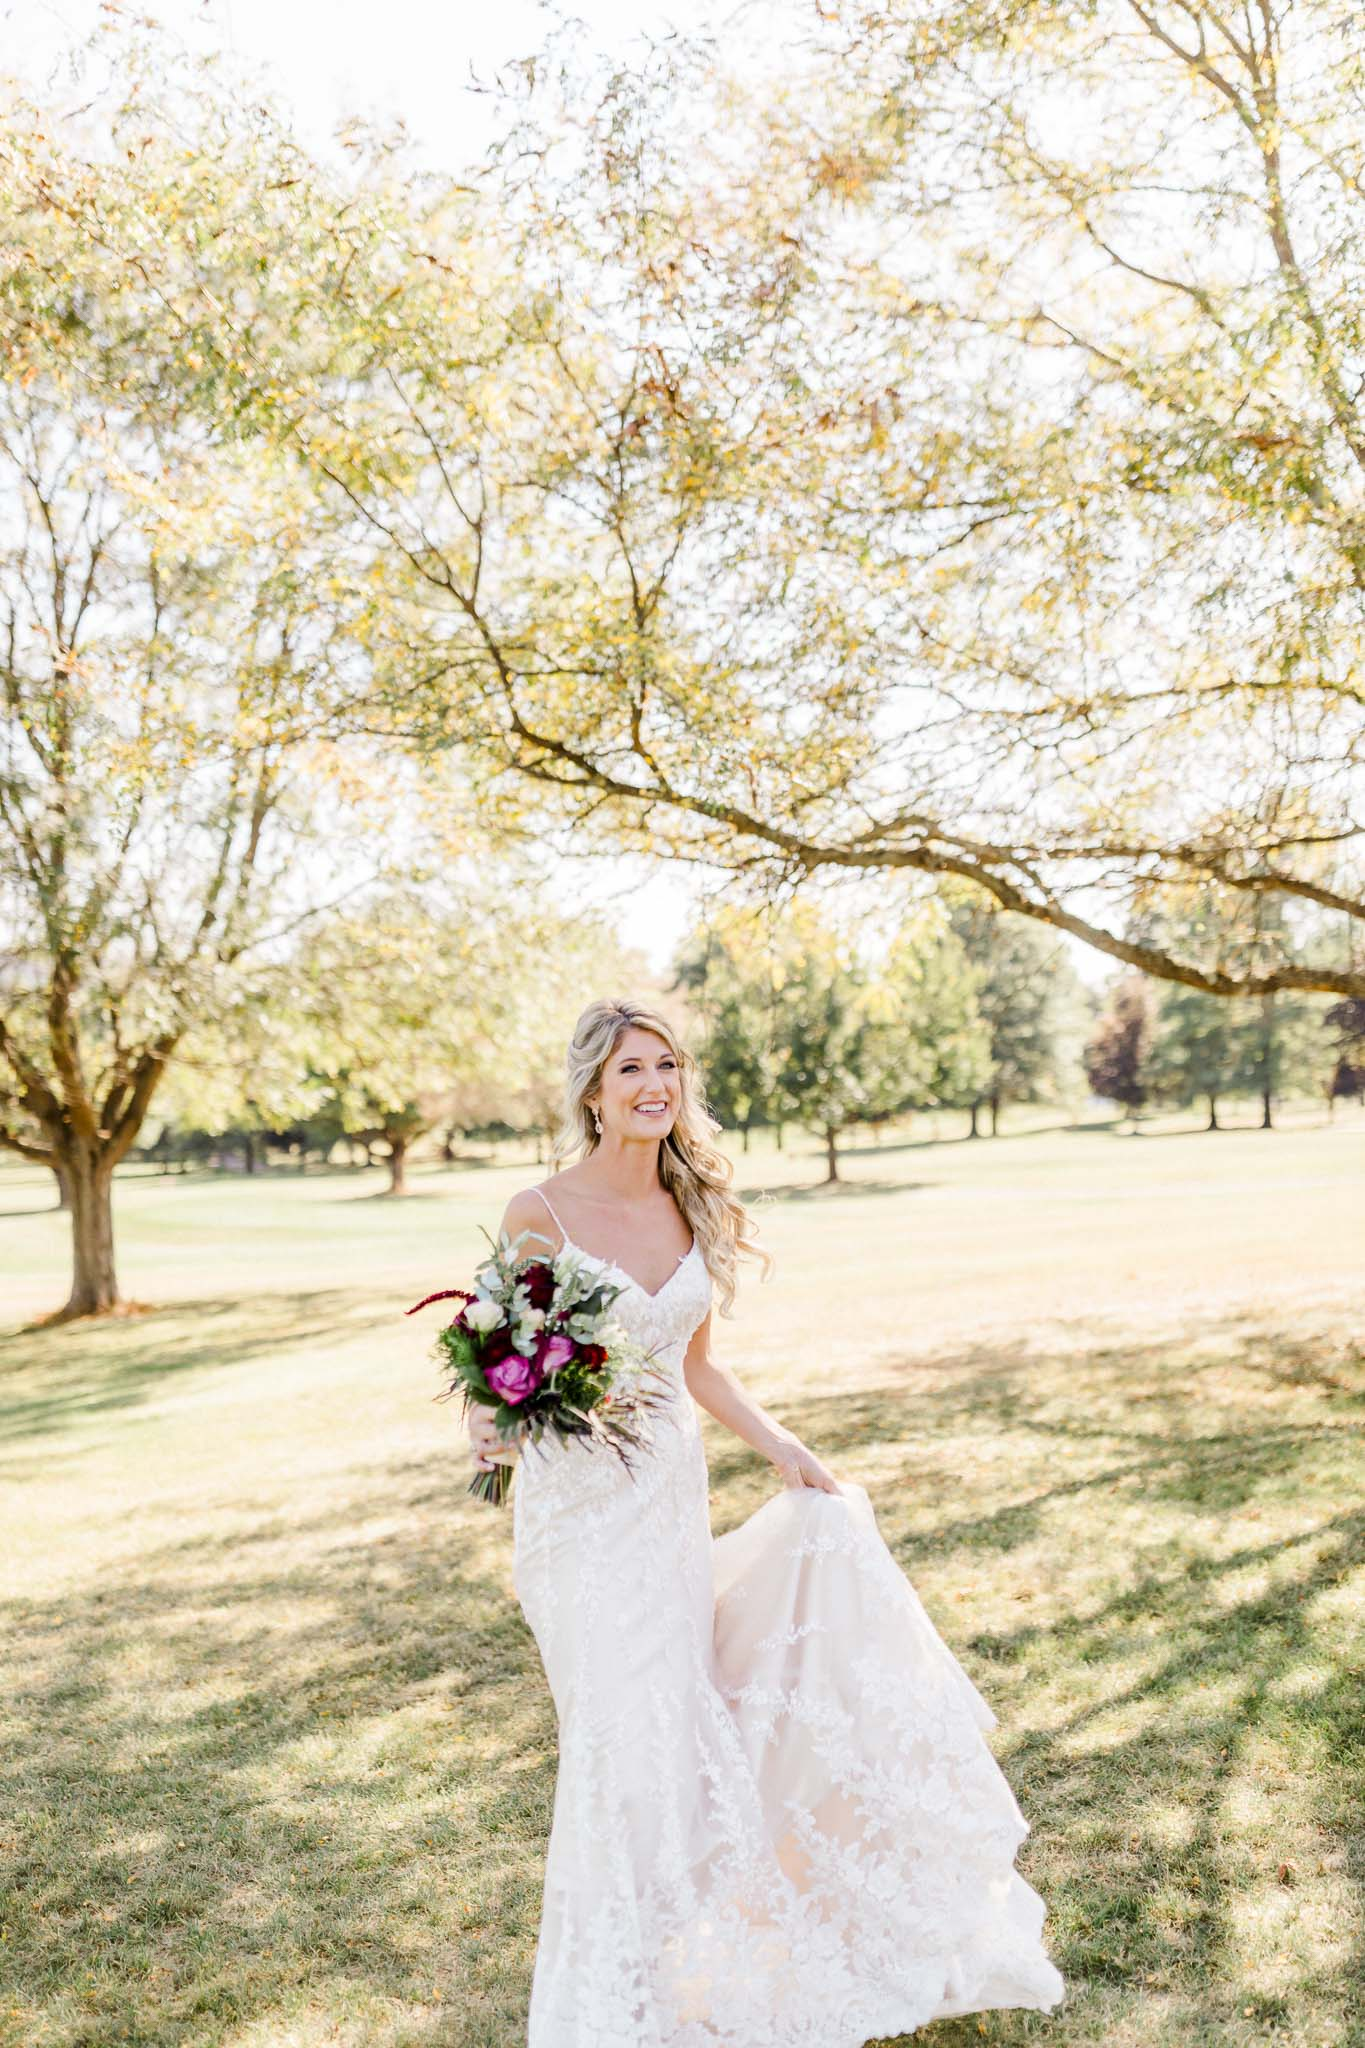 Frosty-Valley-September-Wedding-7639.jpg